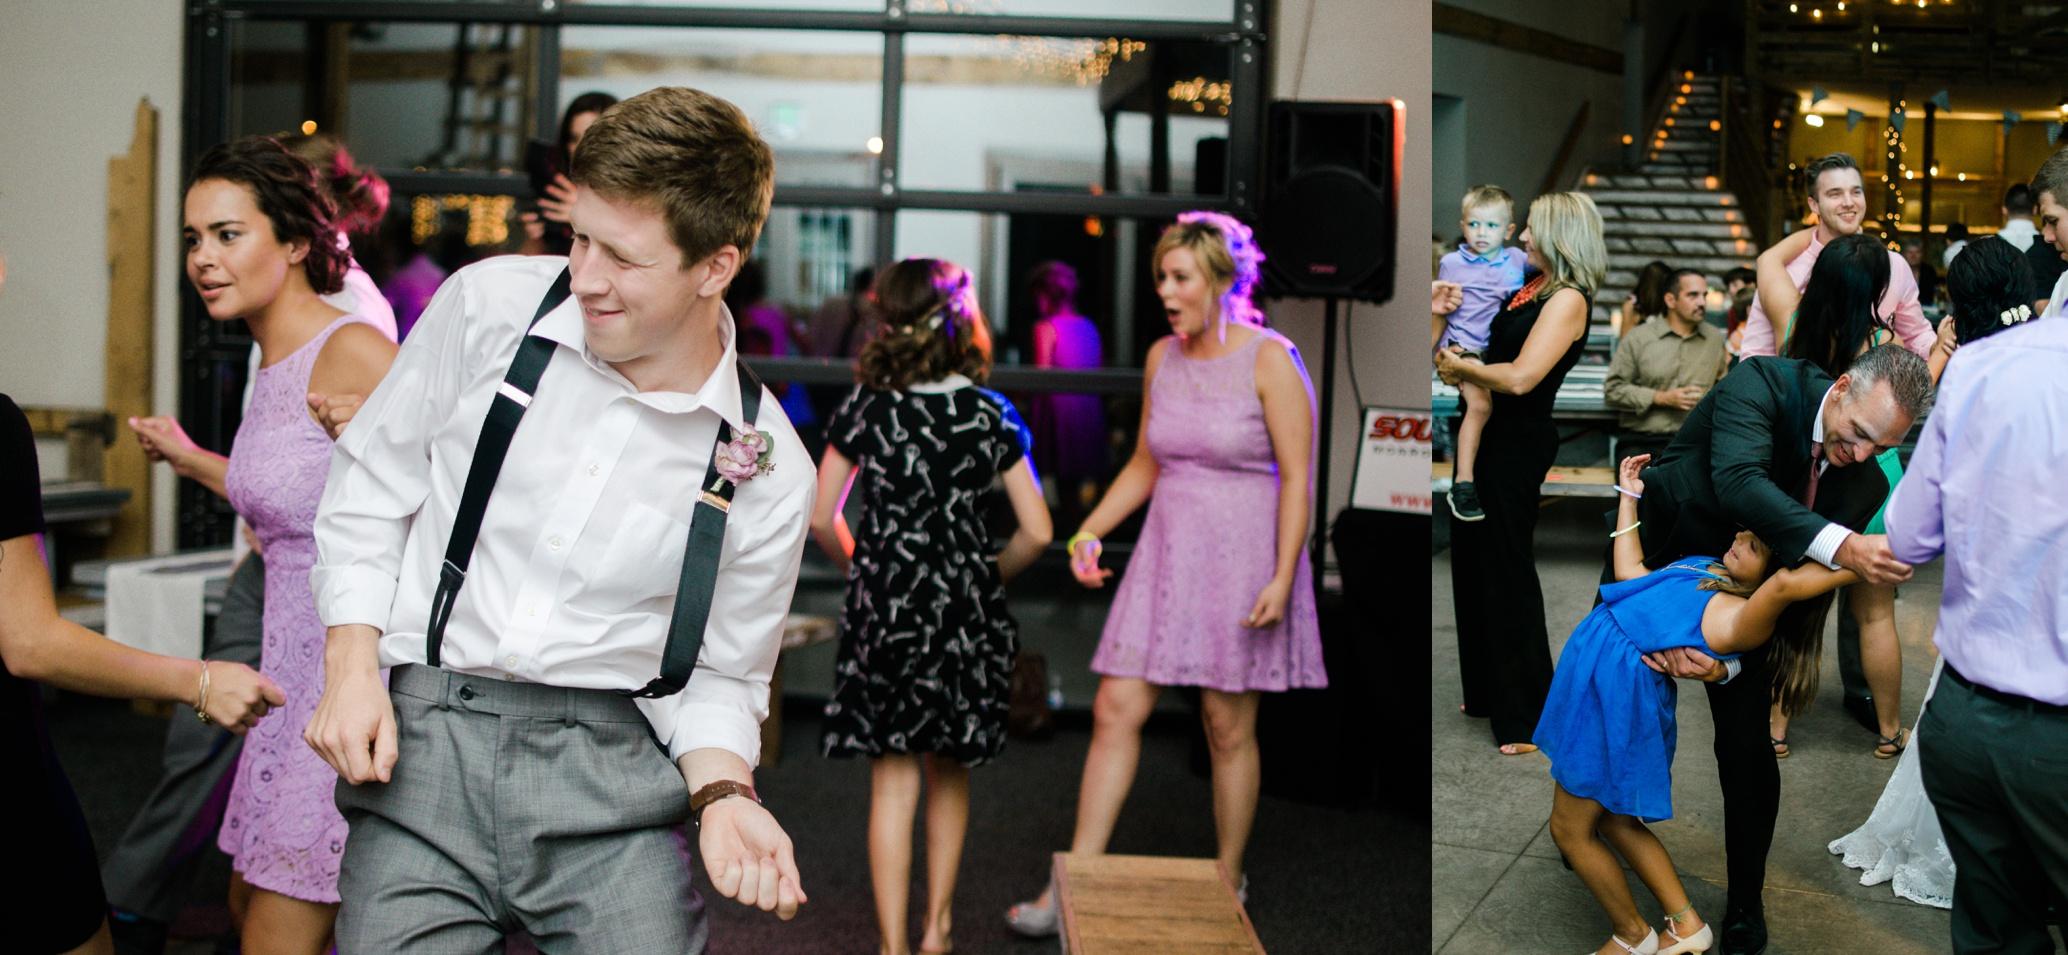 Barnes' Place Rustic Outdoor Wedding | Ali Leigh Photo Minneapolis Wedding Photographer_0178.jpg